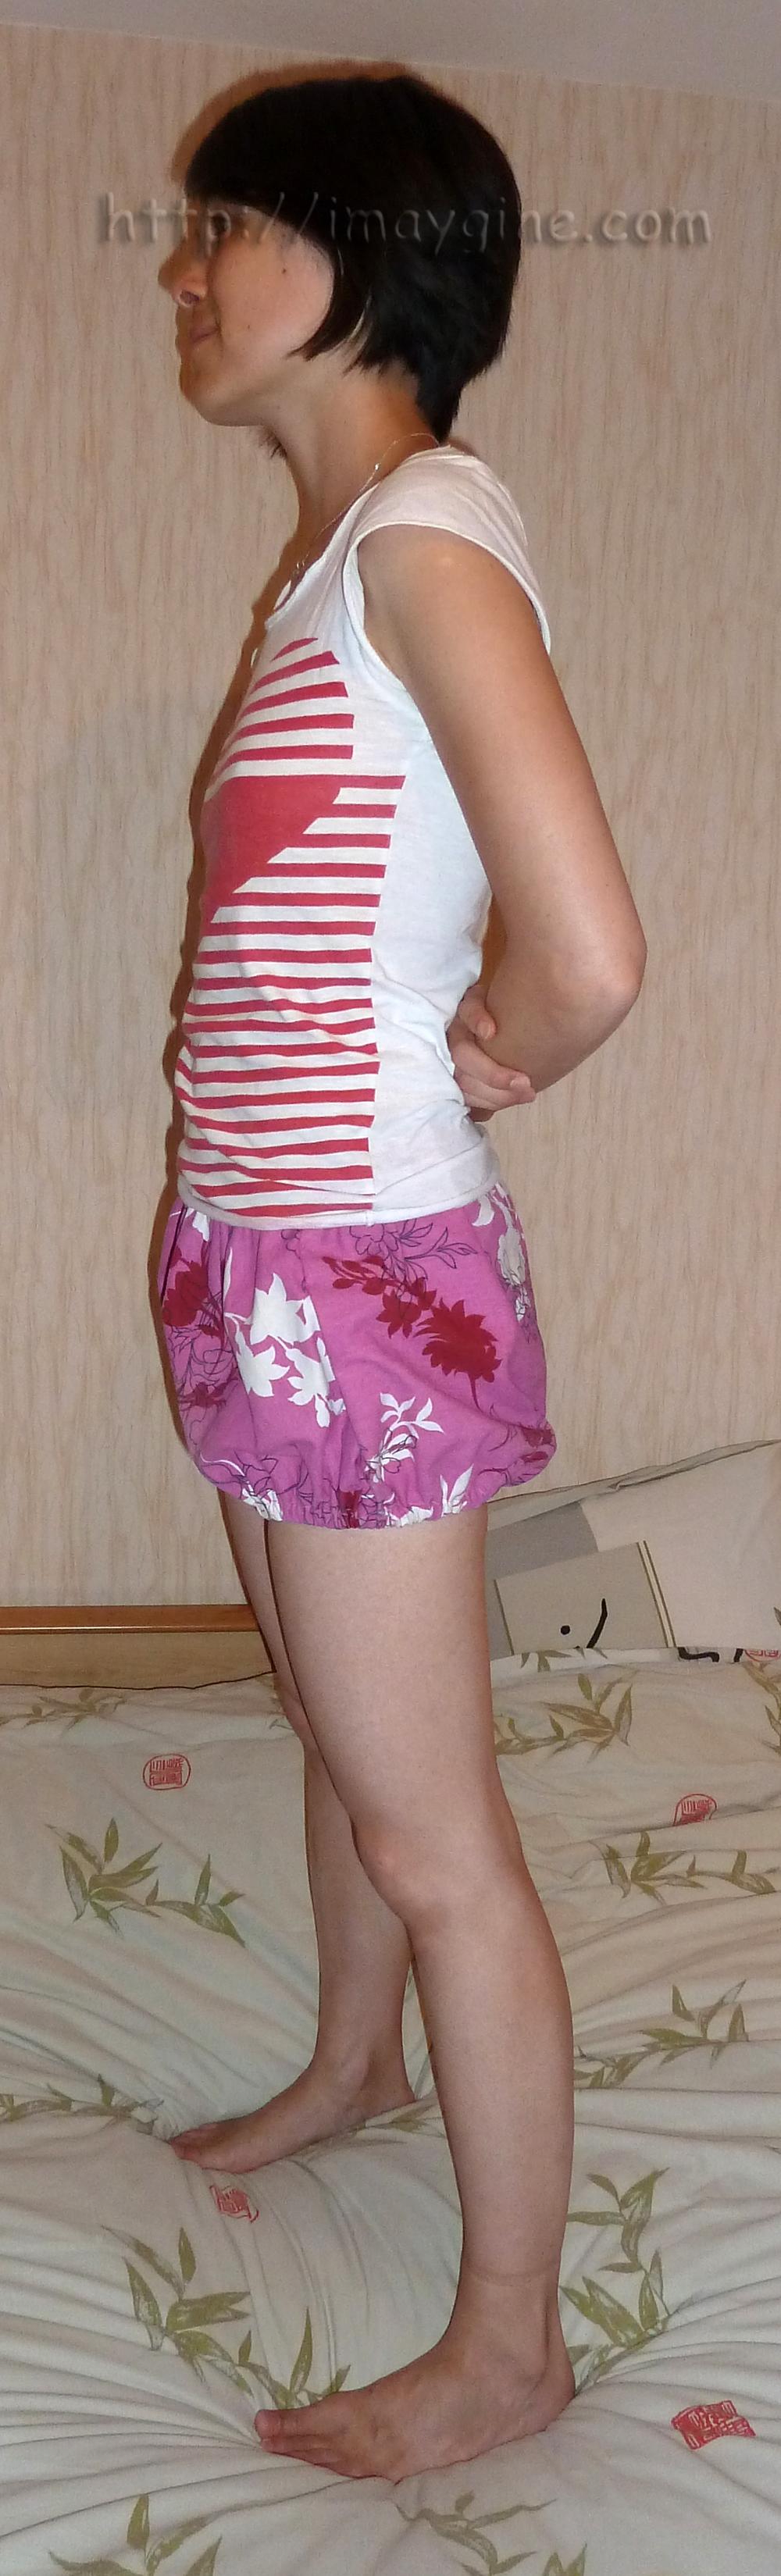 http://www.imaygine.com/wp-content/uploads/2012/08/2bis.jpg